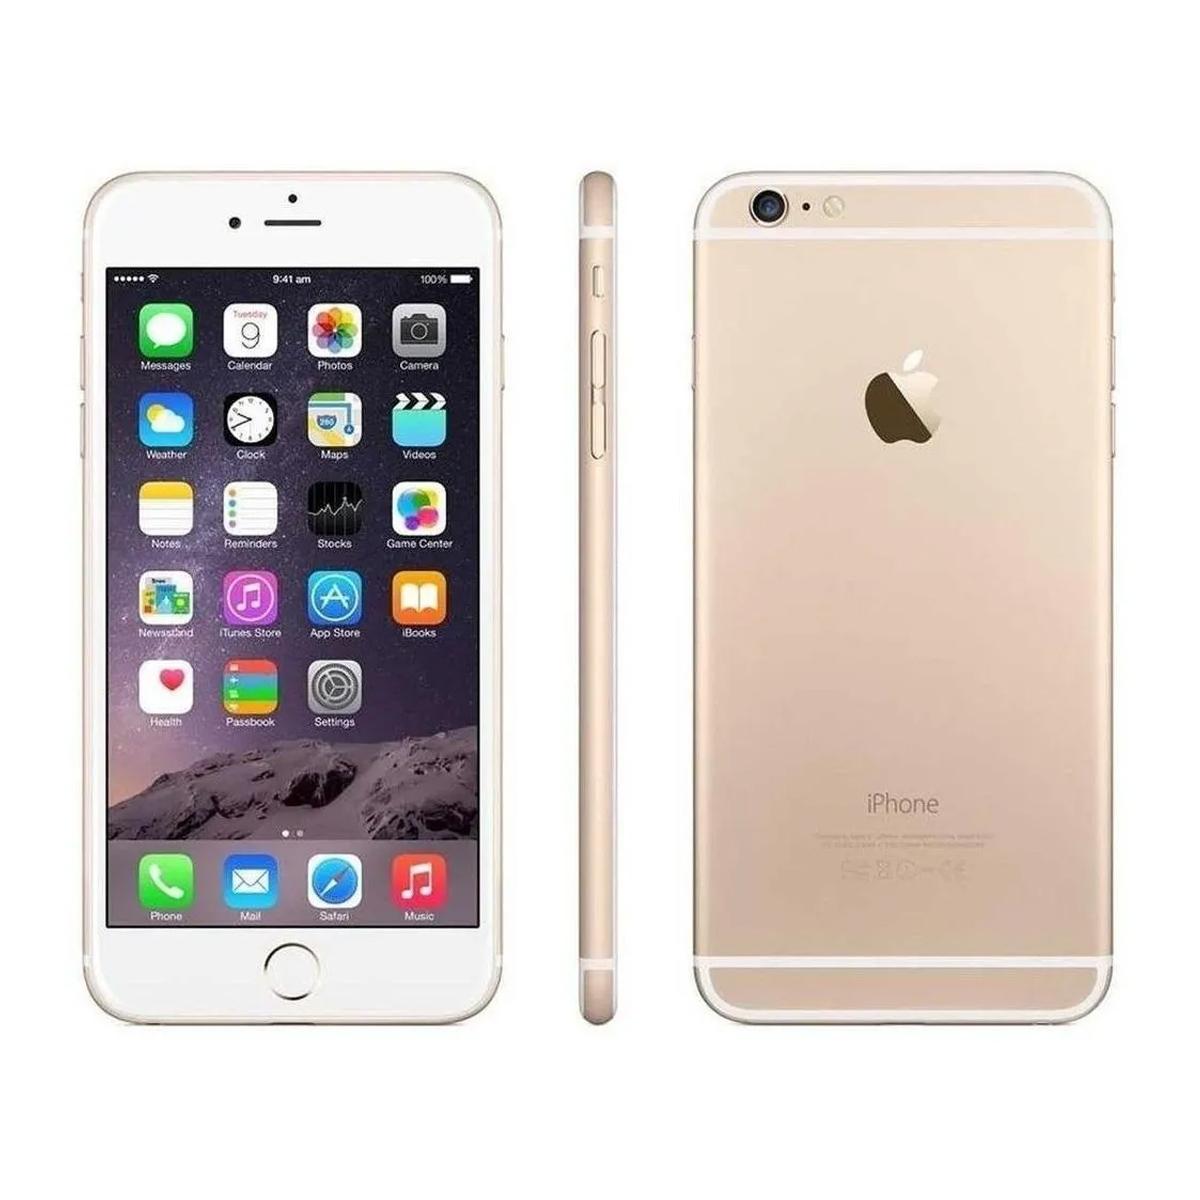 Smartphone Apple iPhone 6 64GB Tela 4.7' 8MP 4G - Usado